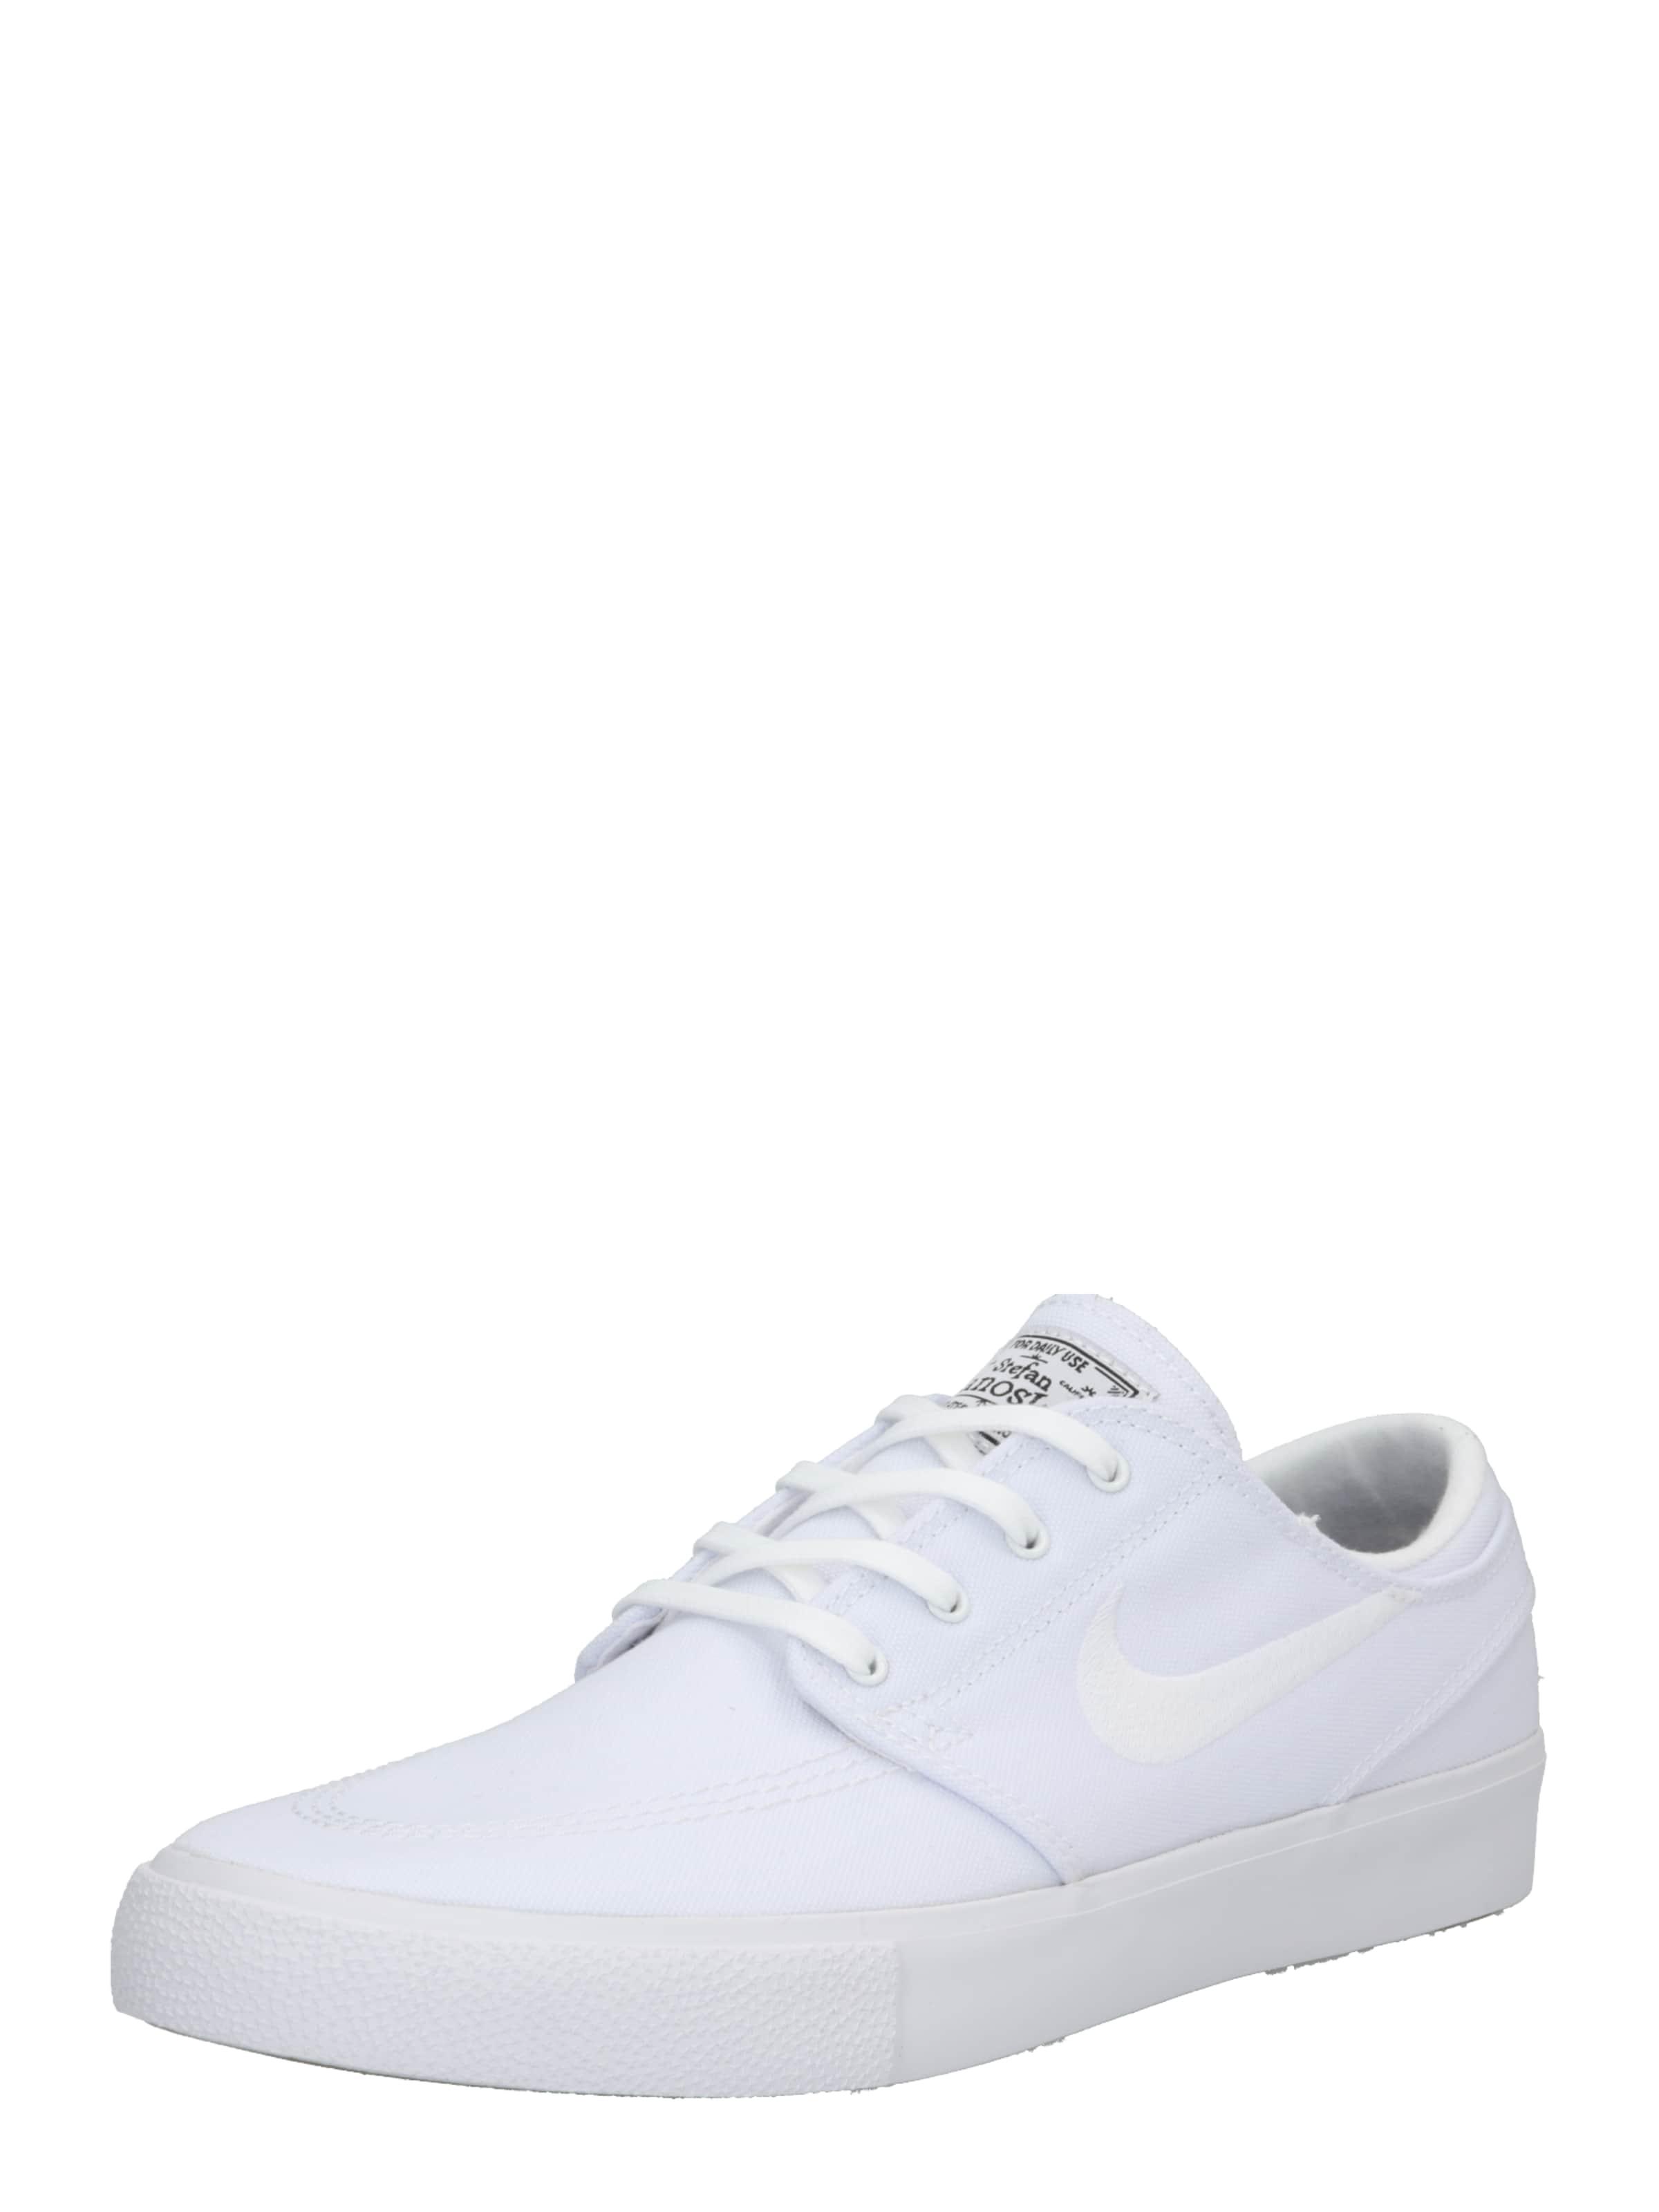 Baskets Sb 'zoom Janoski' Blanc Basses En Nike uJ5lF13TcK